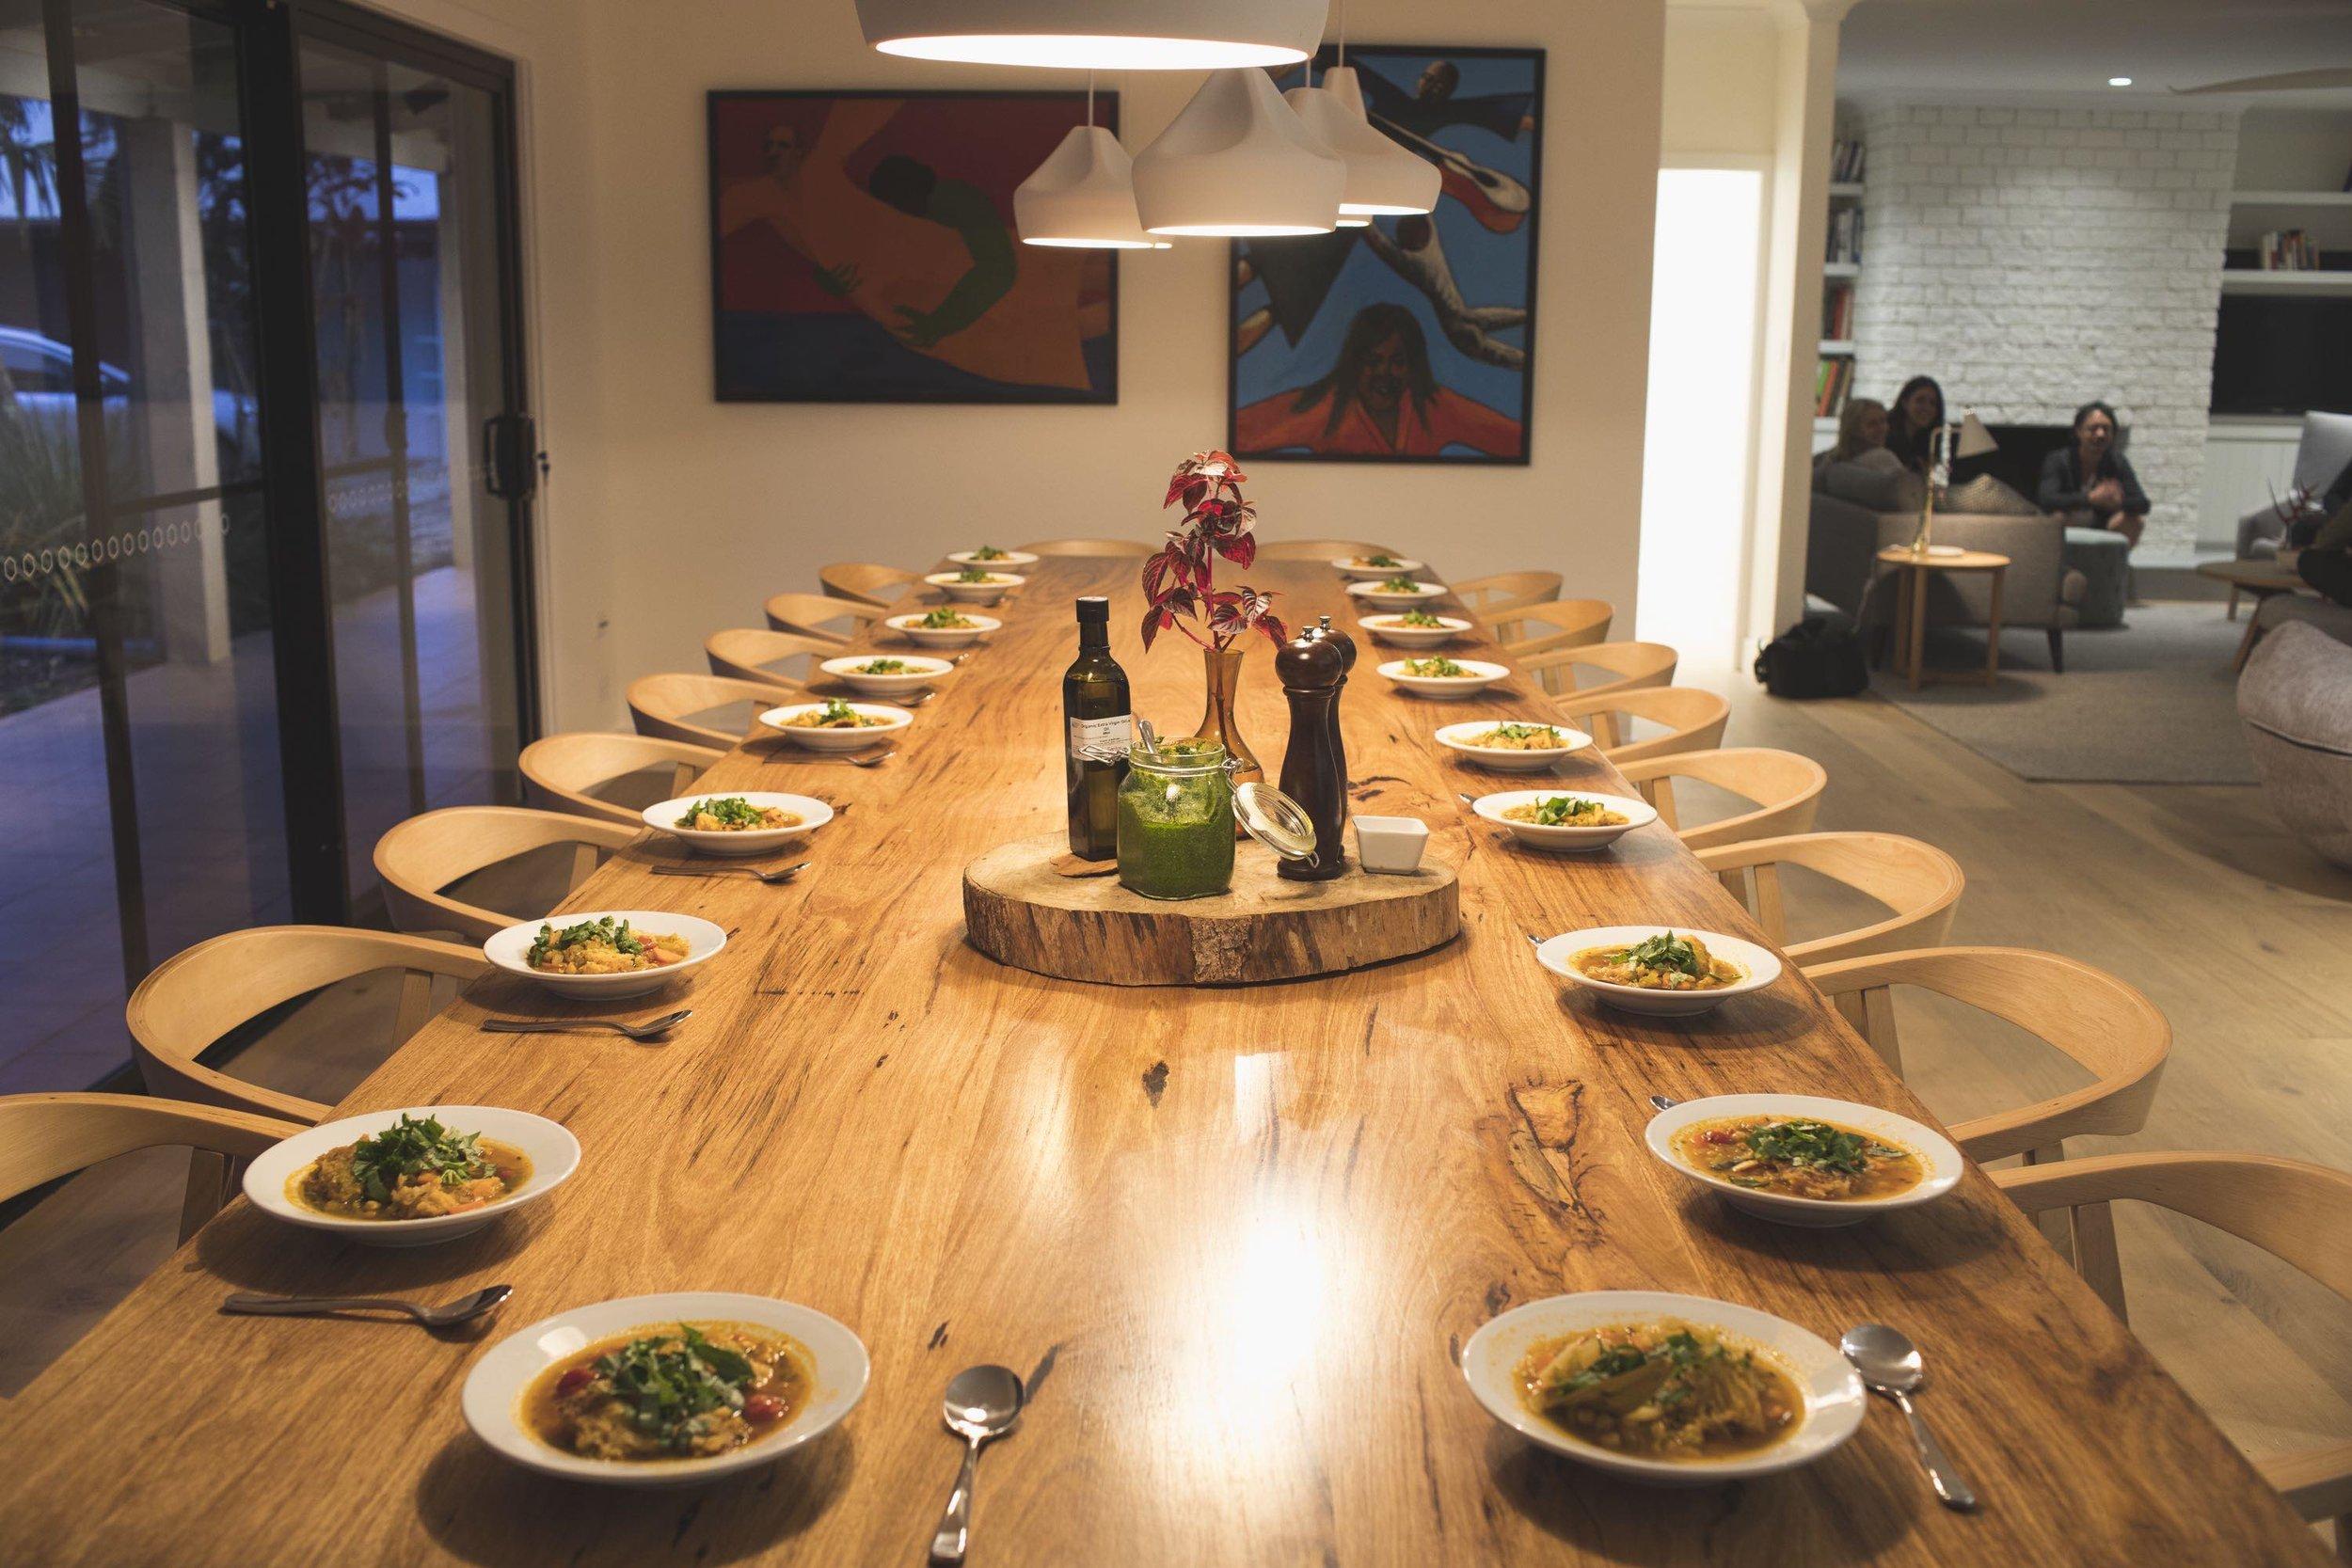 dinner table empty.jpg